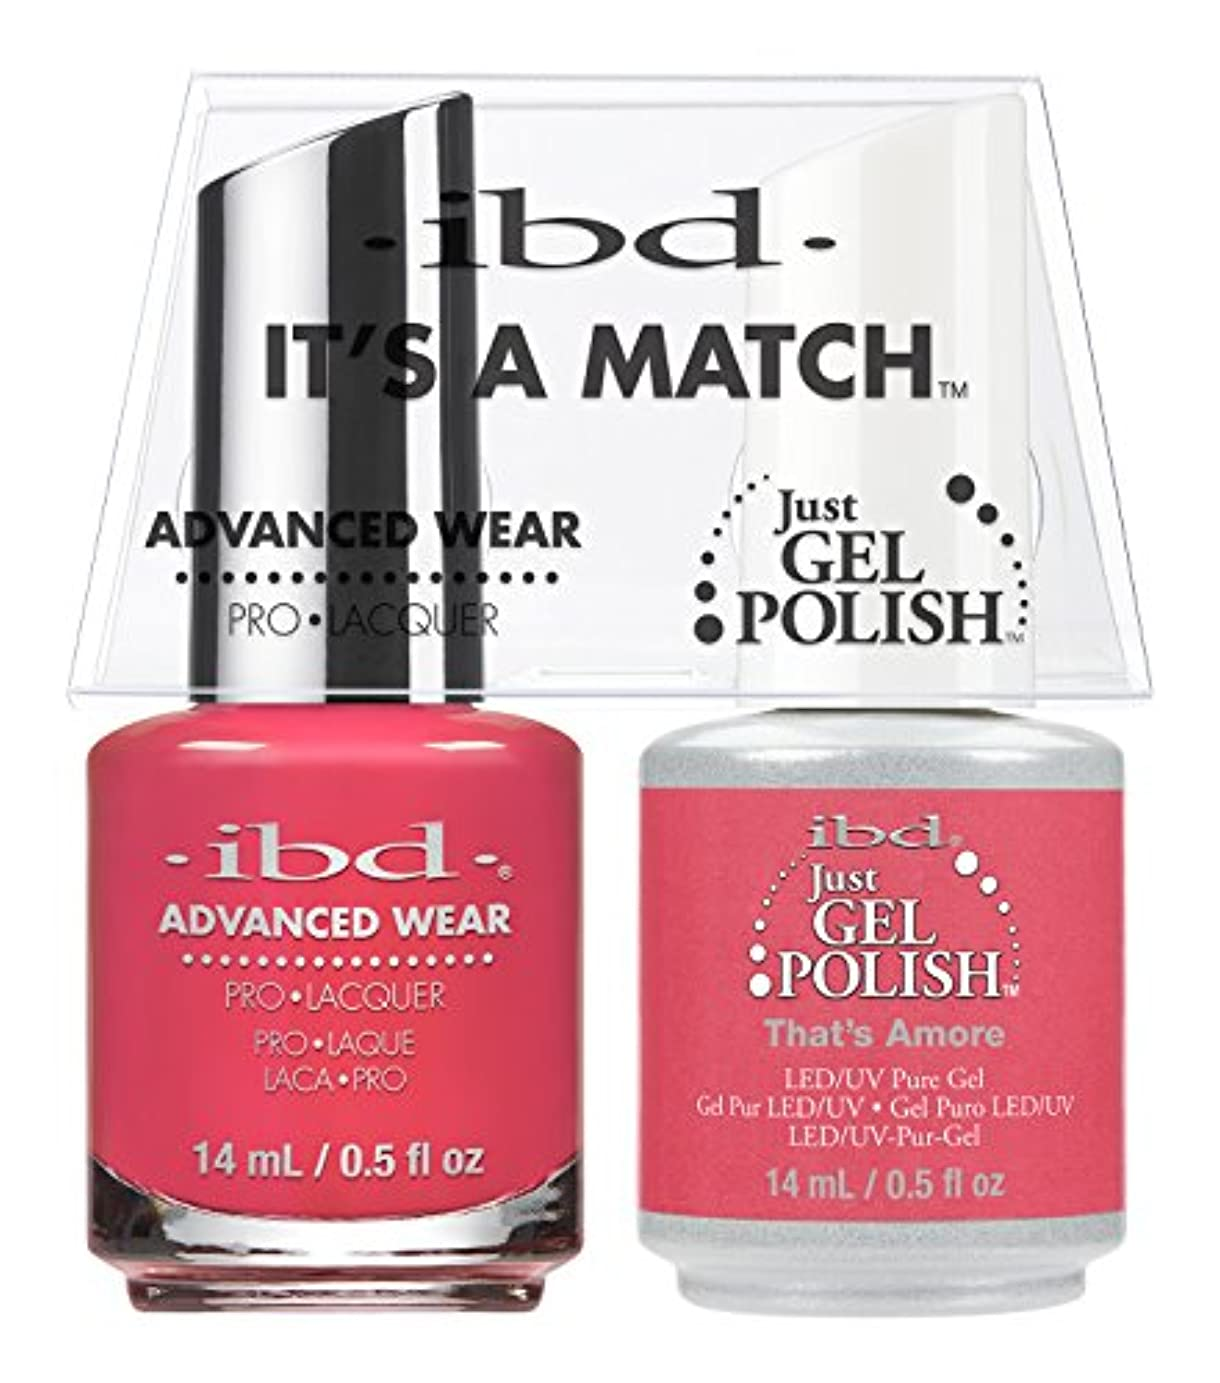 懲戒段階加速度ibd - It's A Match -Duo Pack- That's Amore - 14 mL / 0.5 oz Each